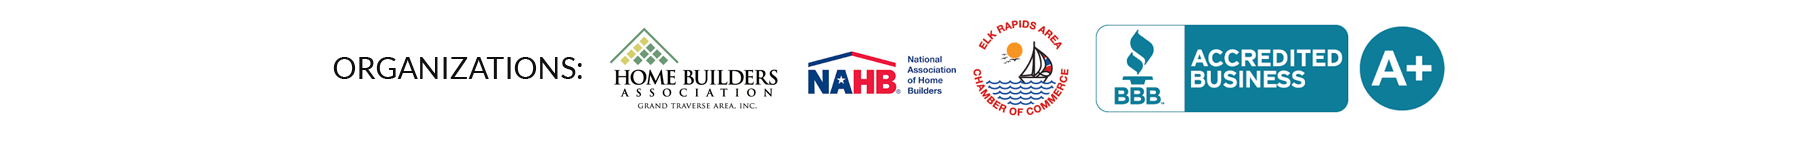 Northern–Michigan Home Builders Socialproof